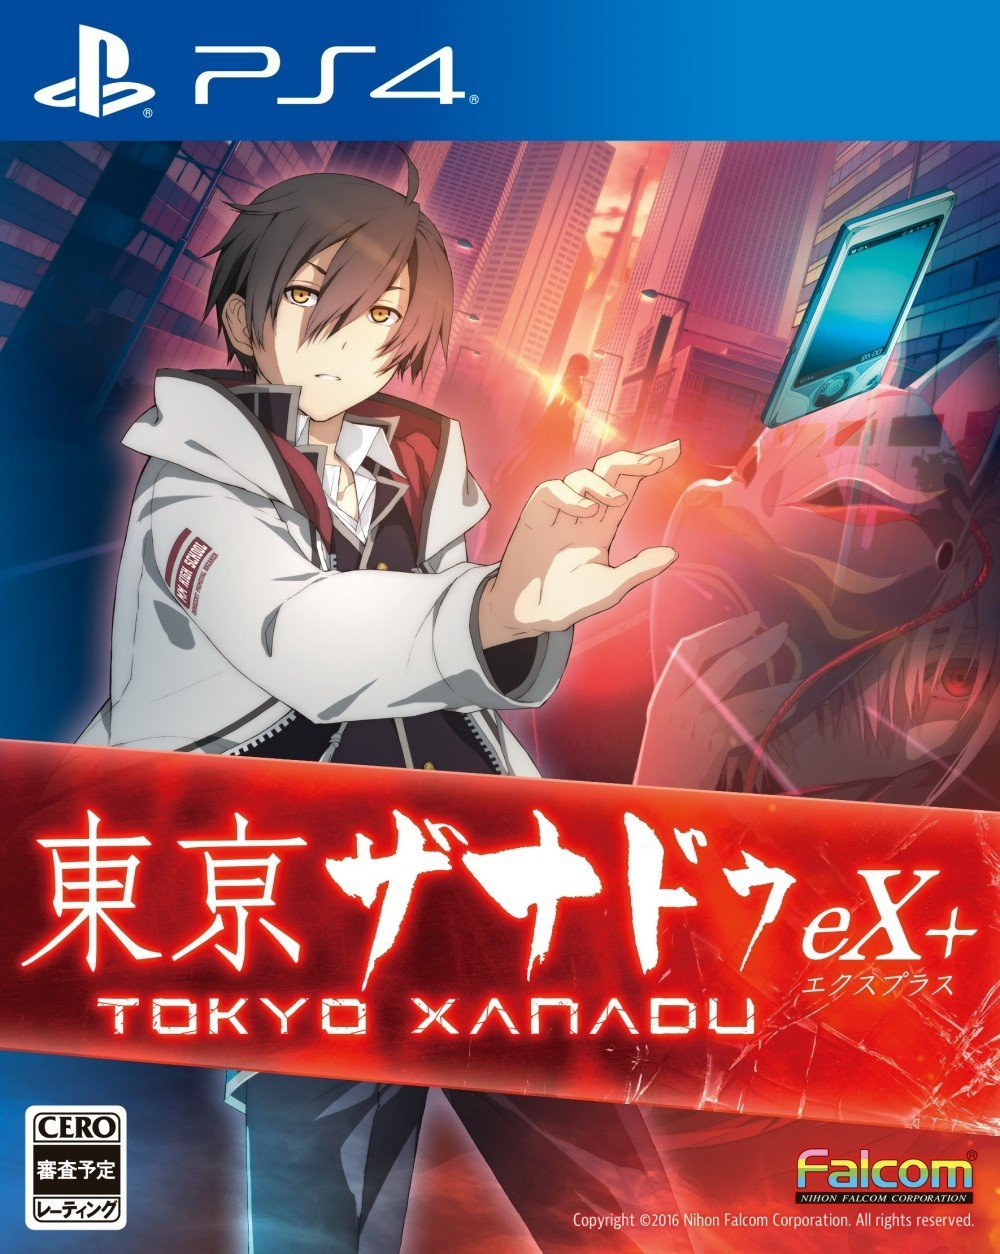 tokyo_xanadu_ex+.jpg